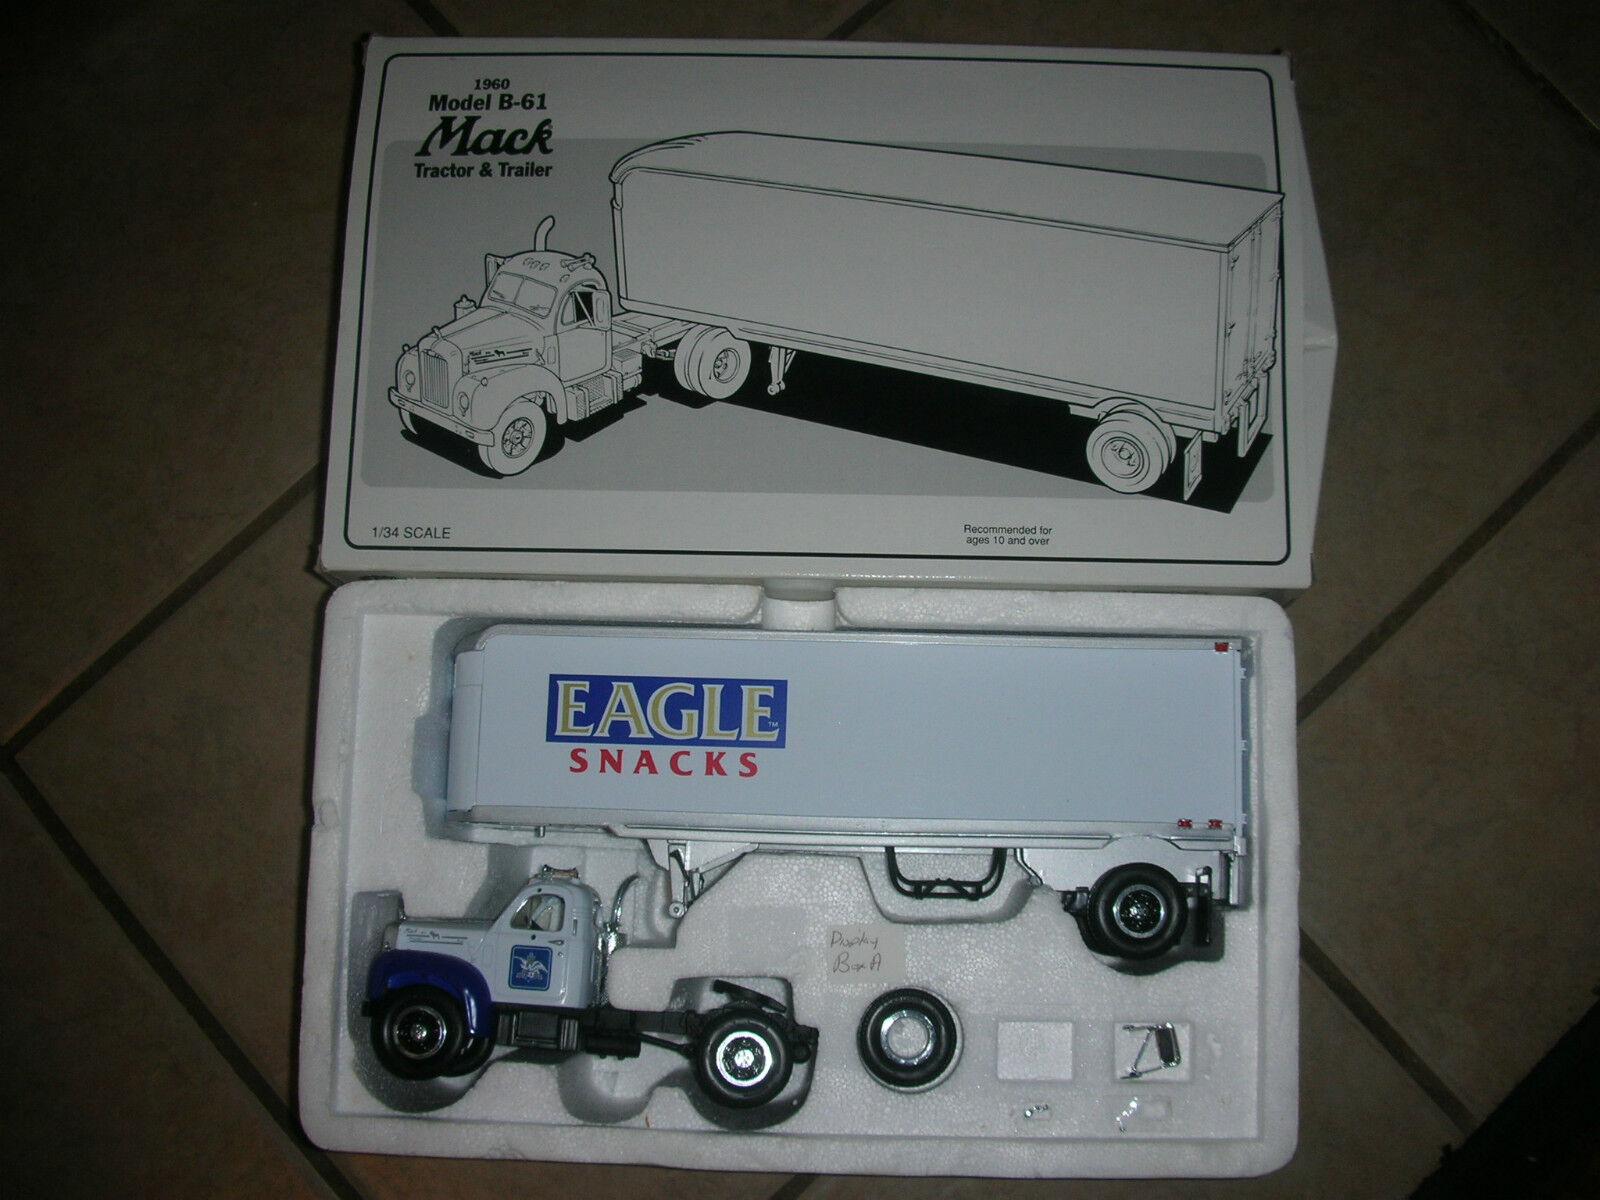 First Gear Mack 1960 Model B-61 Tractor & Trailer- Eagle Snacks  4   (B 5)